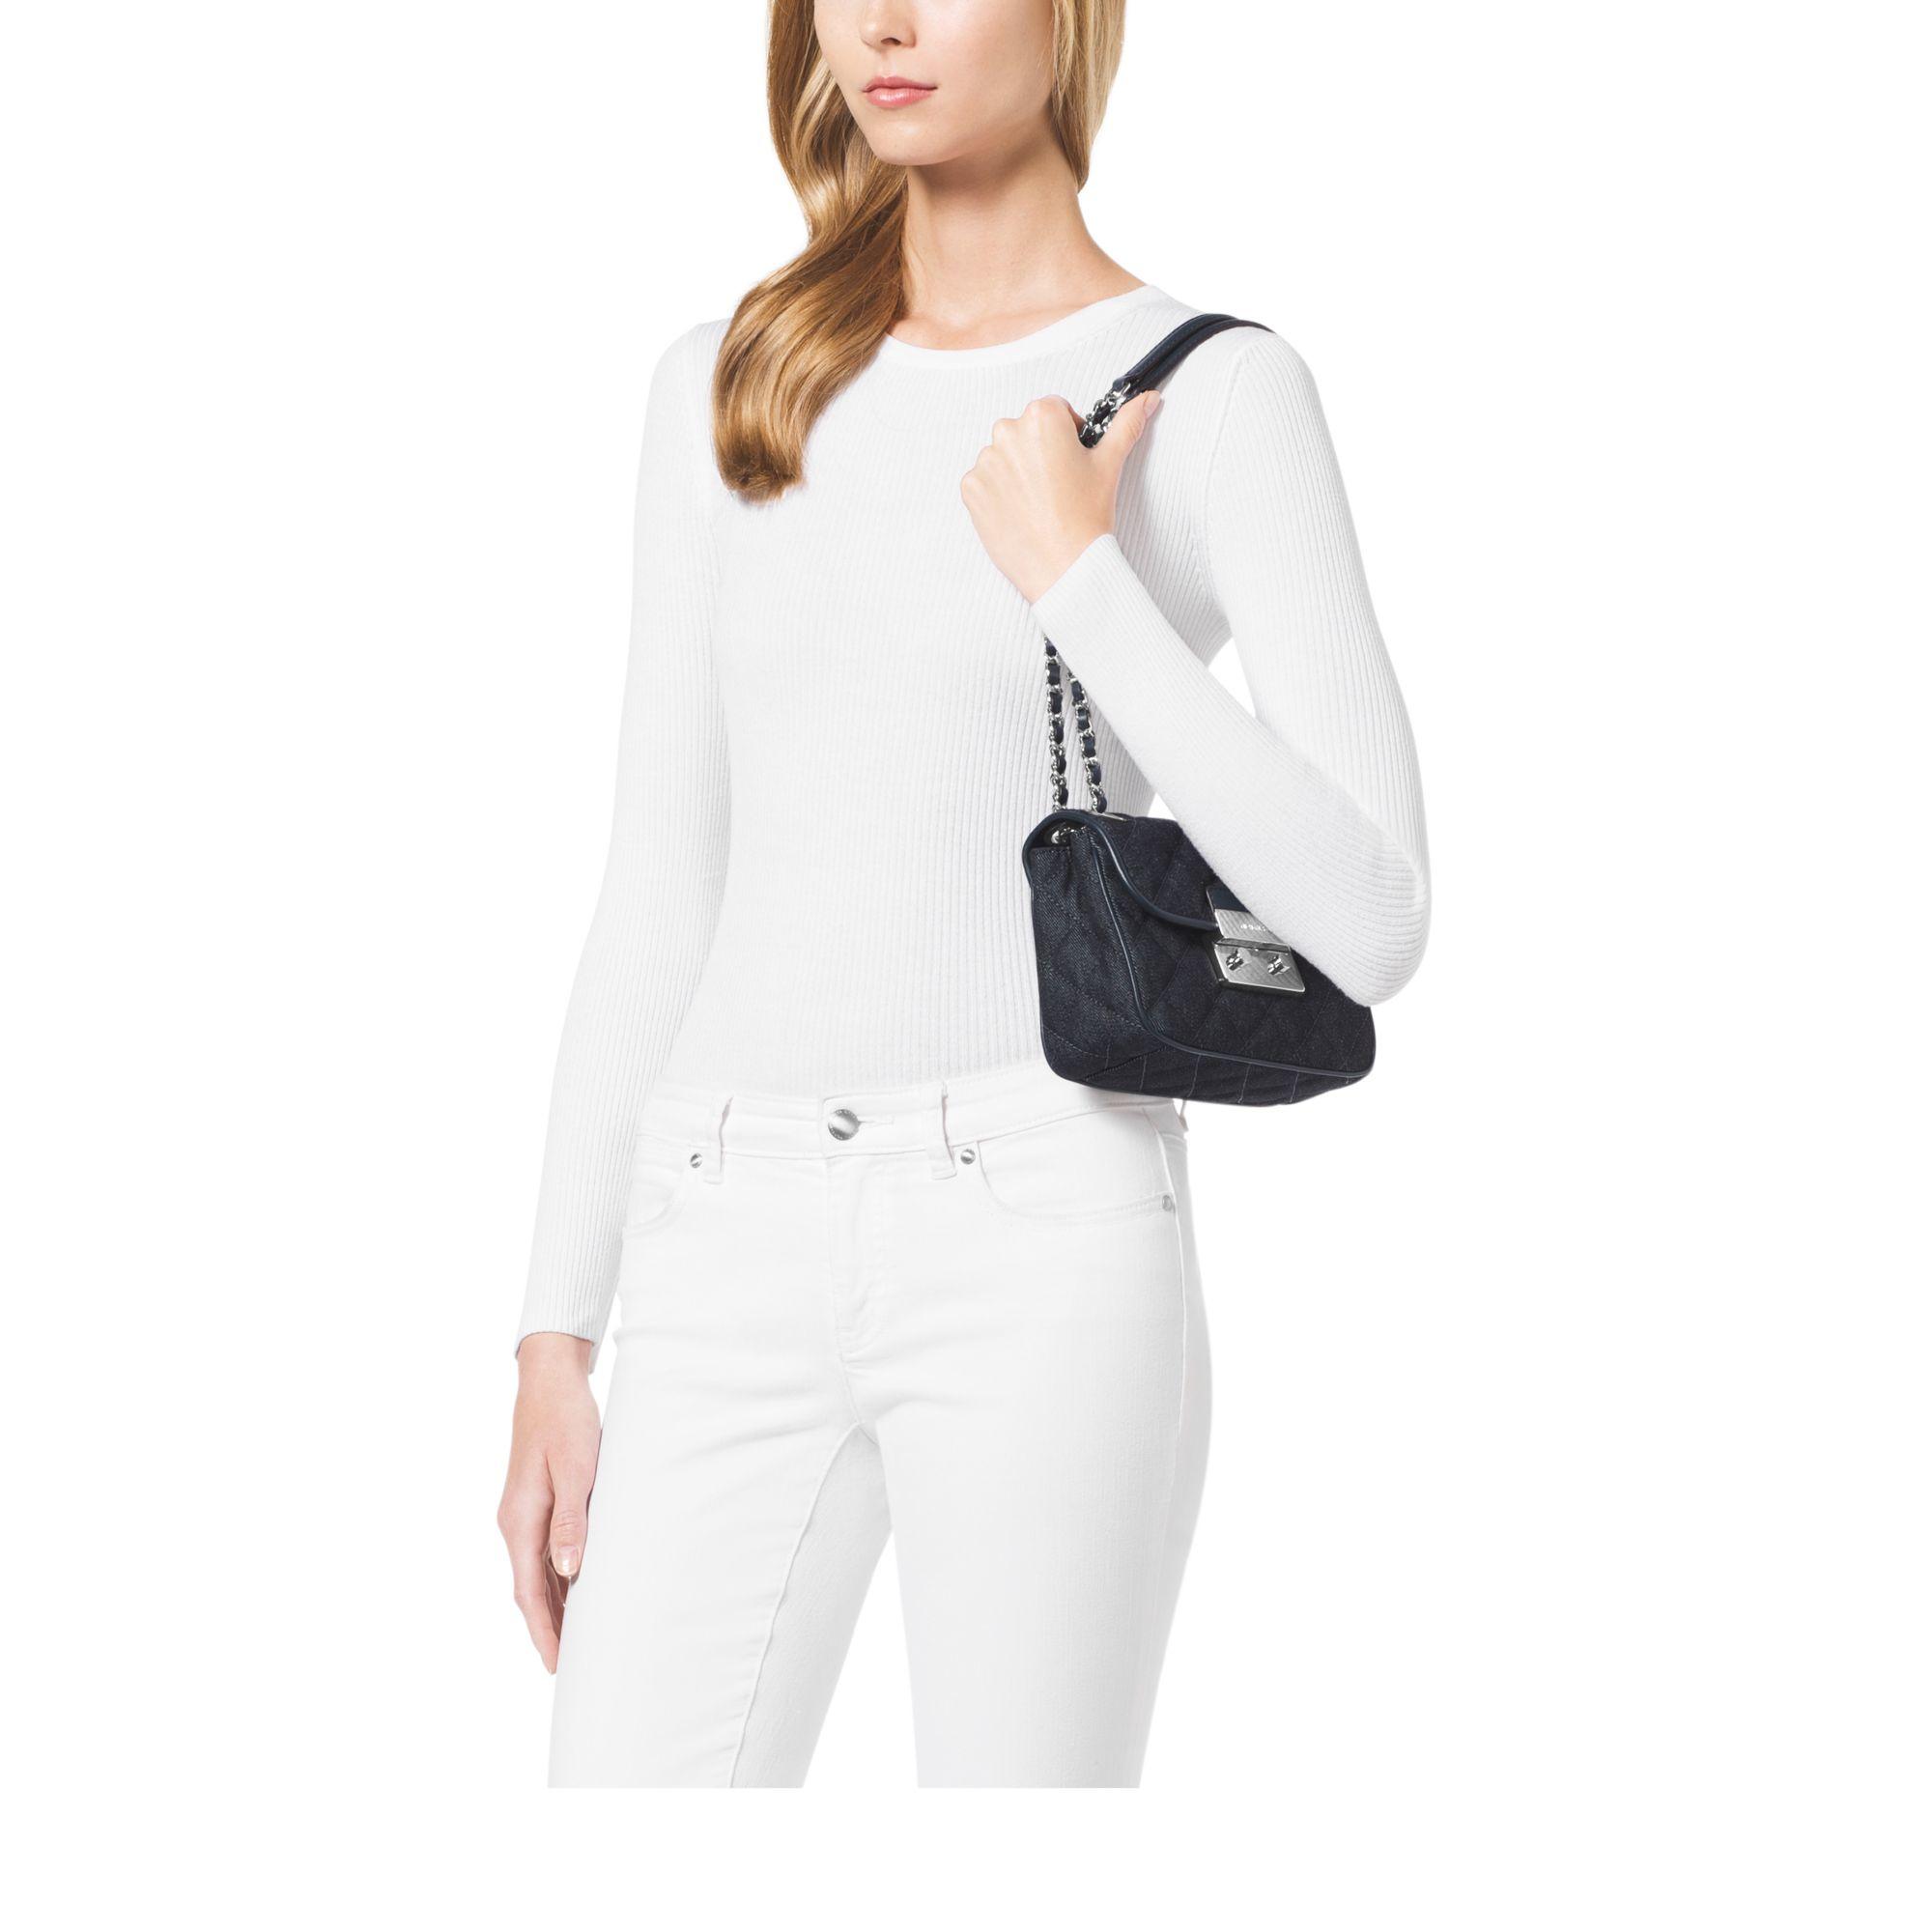 Michael Kors Small Sloan Quilted Shoulder Bag 106